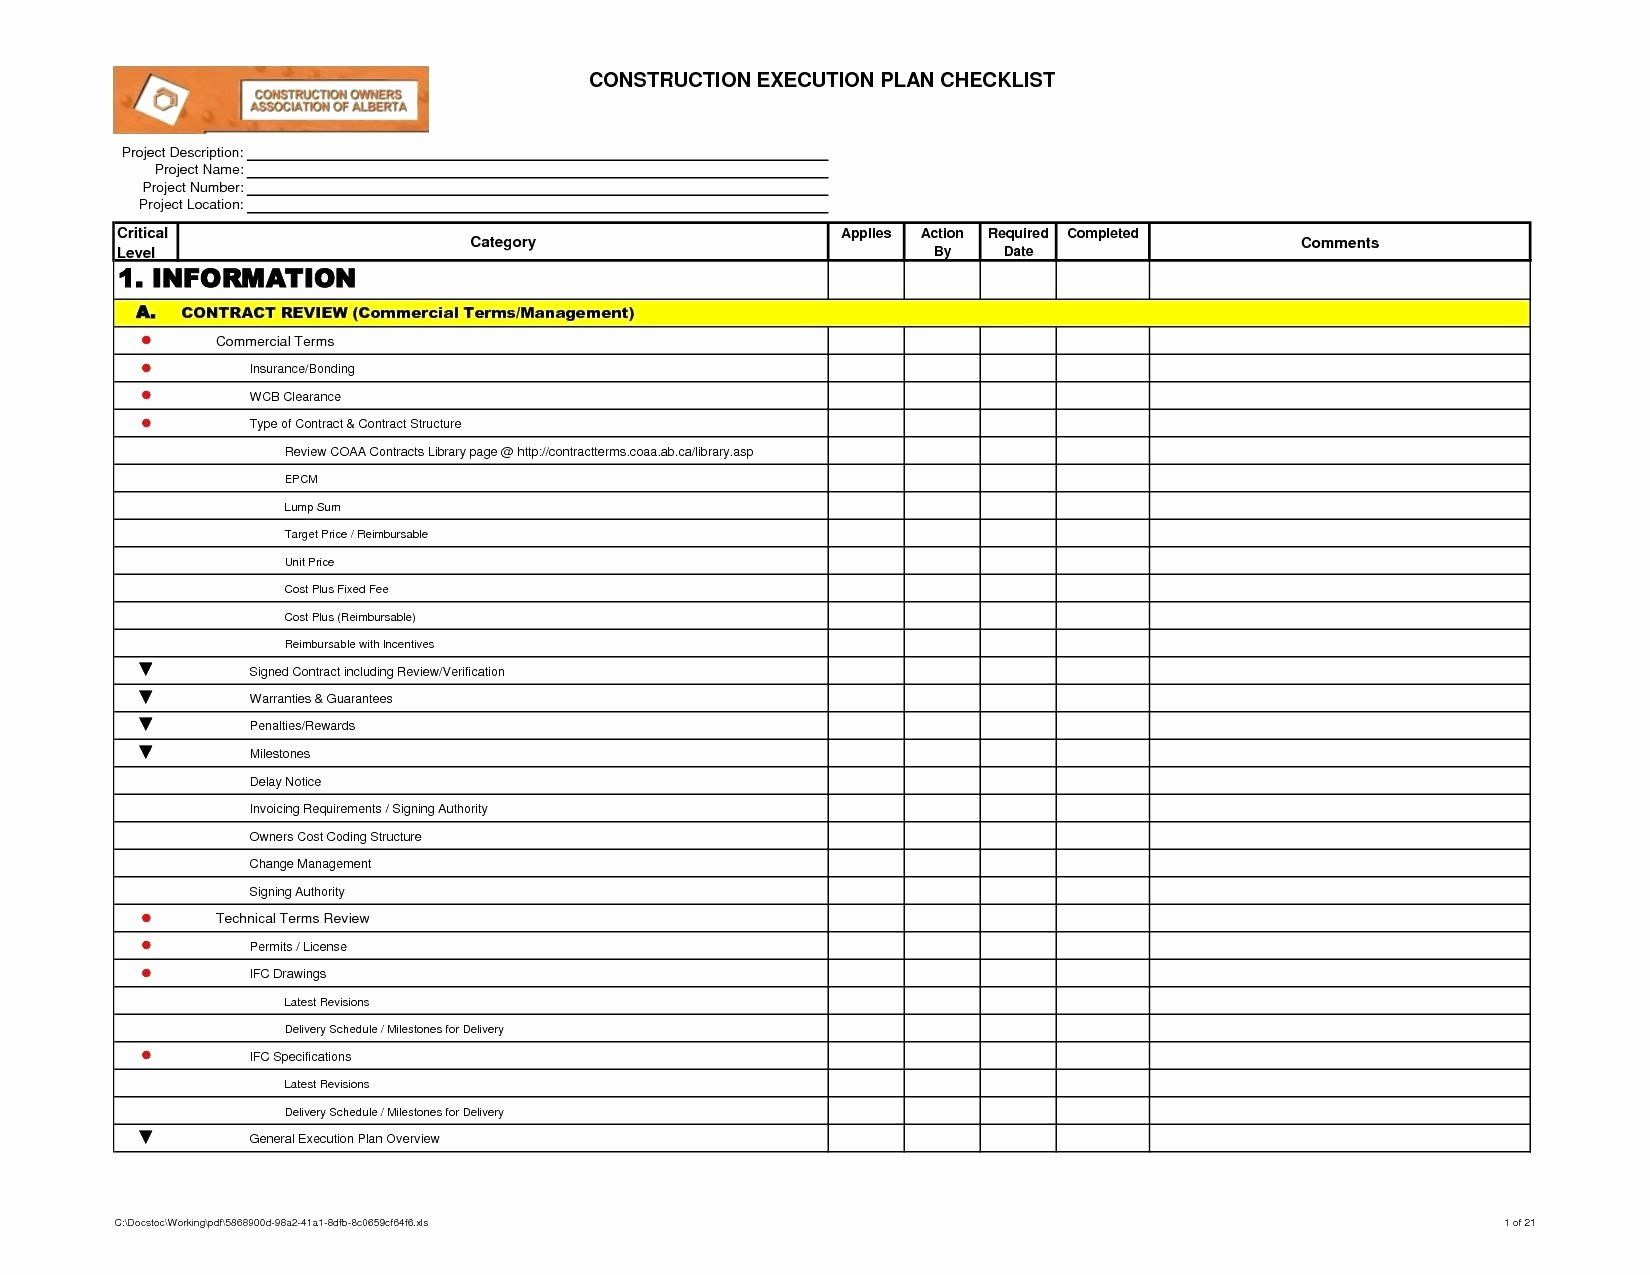 Building Maintenance Schedule Excel Template Beautiful Building Maintenance Event Planning Checklist Templates Event Planning Checklist Event Planning Template